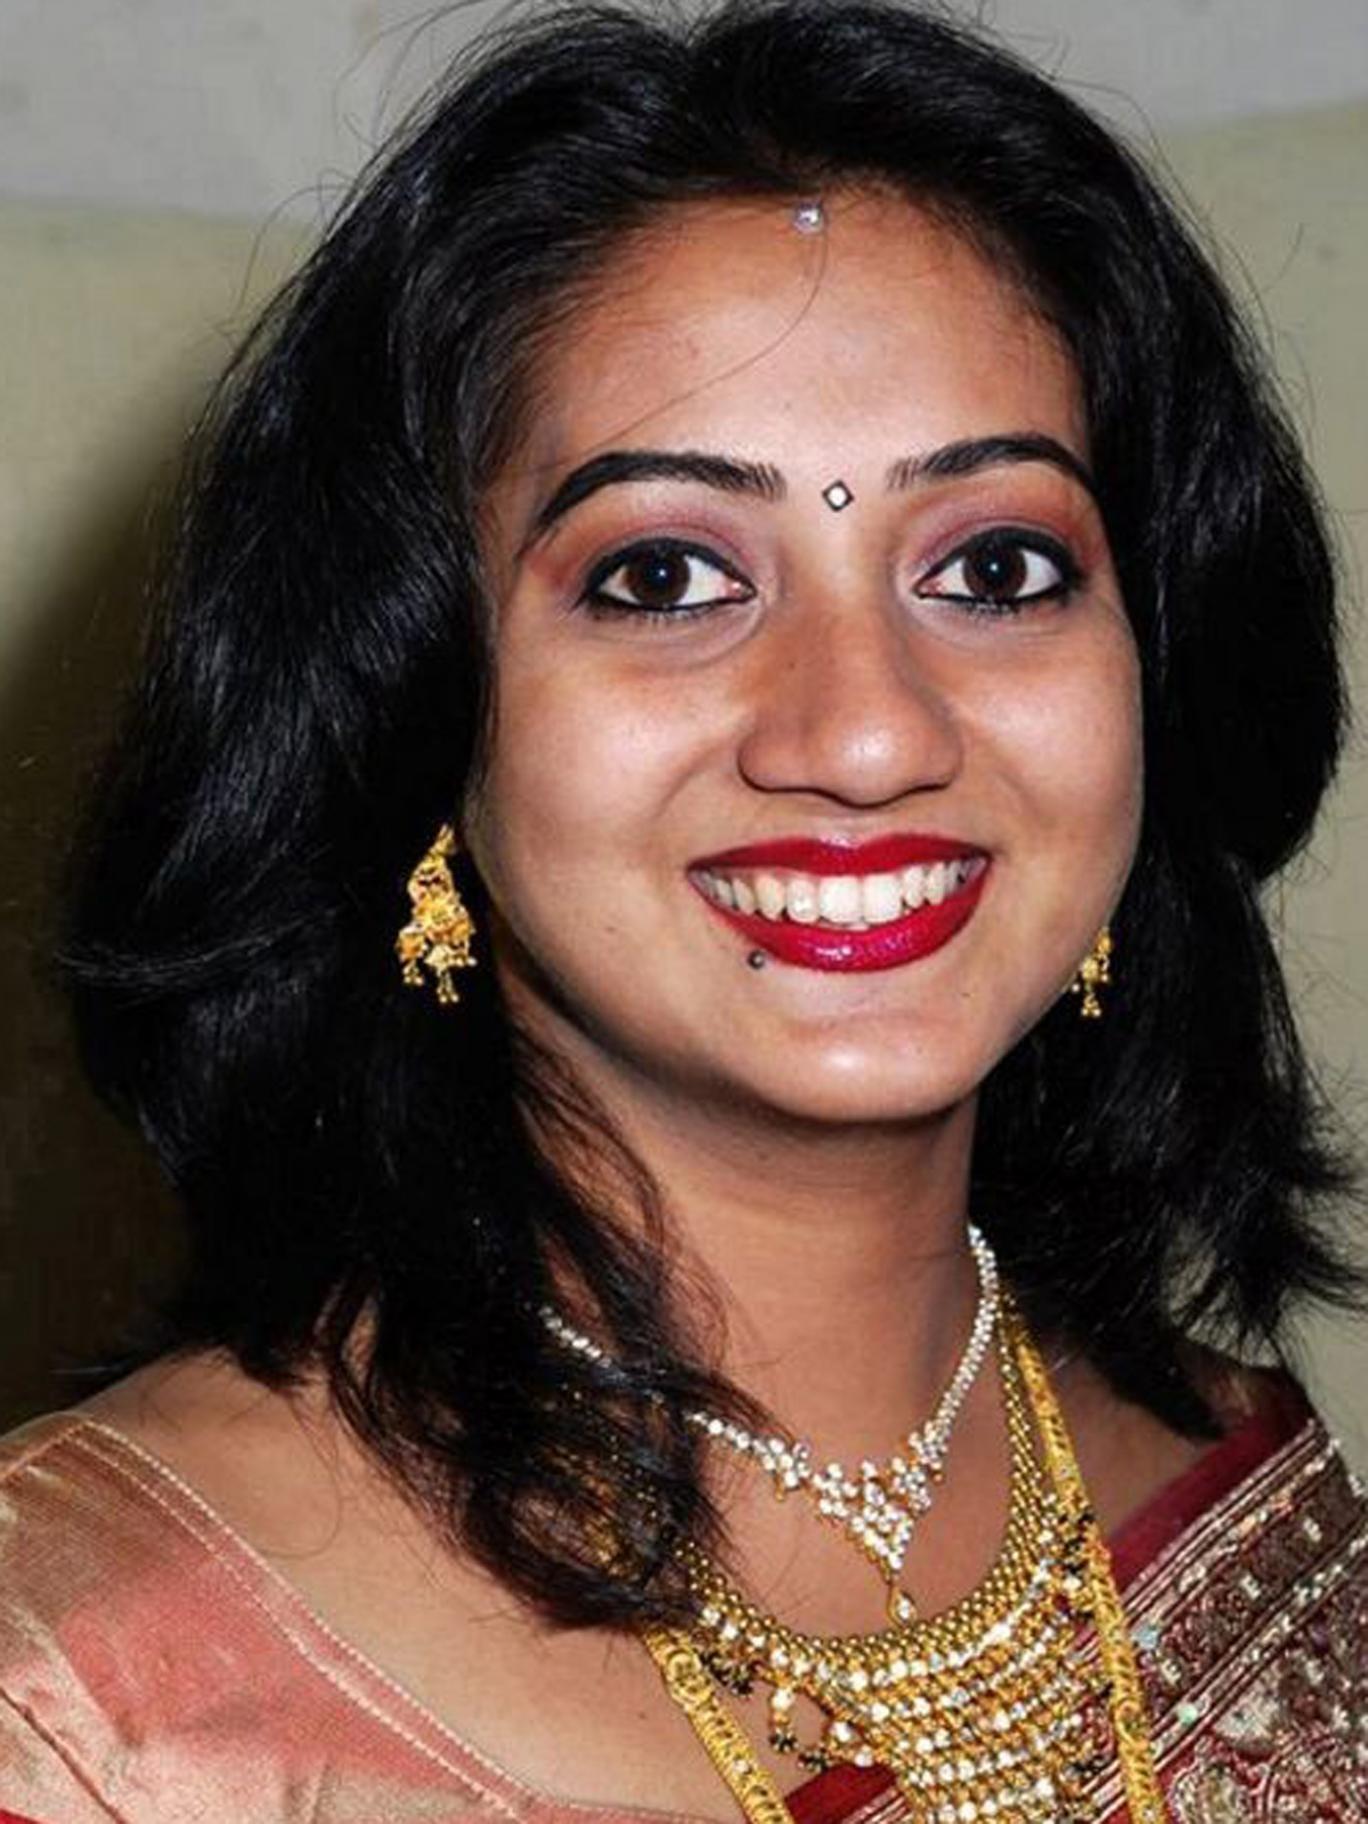 The plans follow the tragic death Savita Halappanavar, who miscarried 17 weeks into her pregnancy